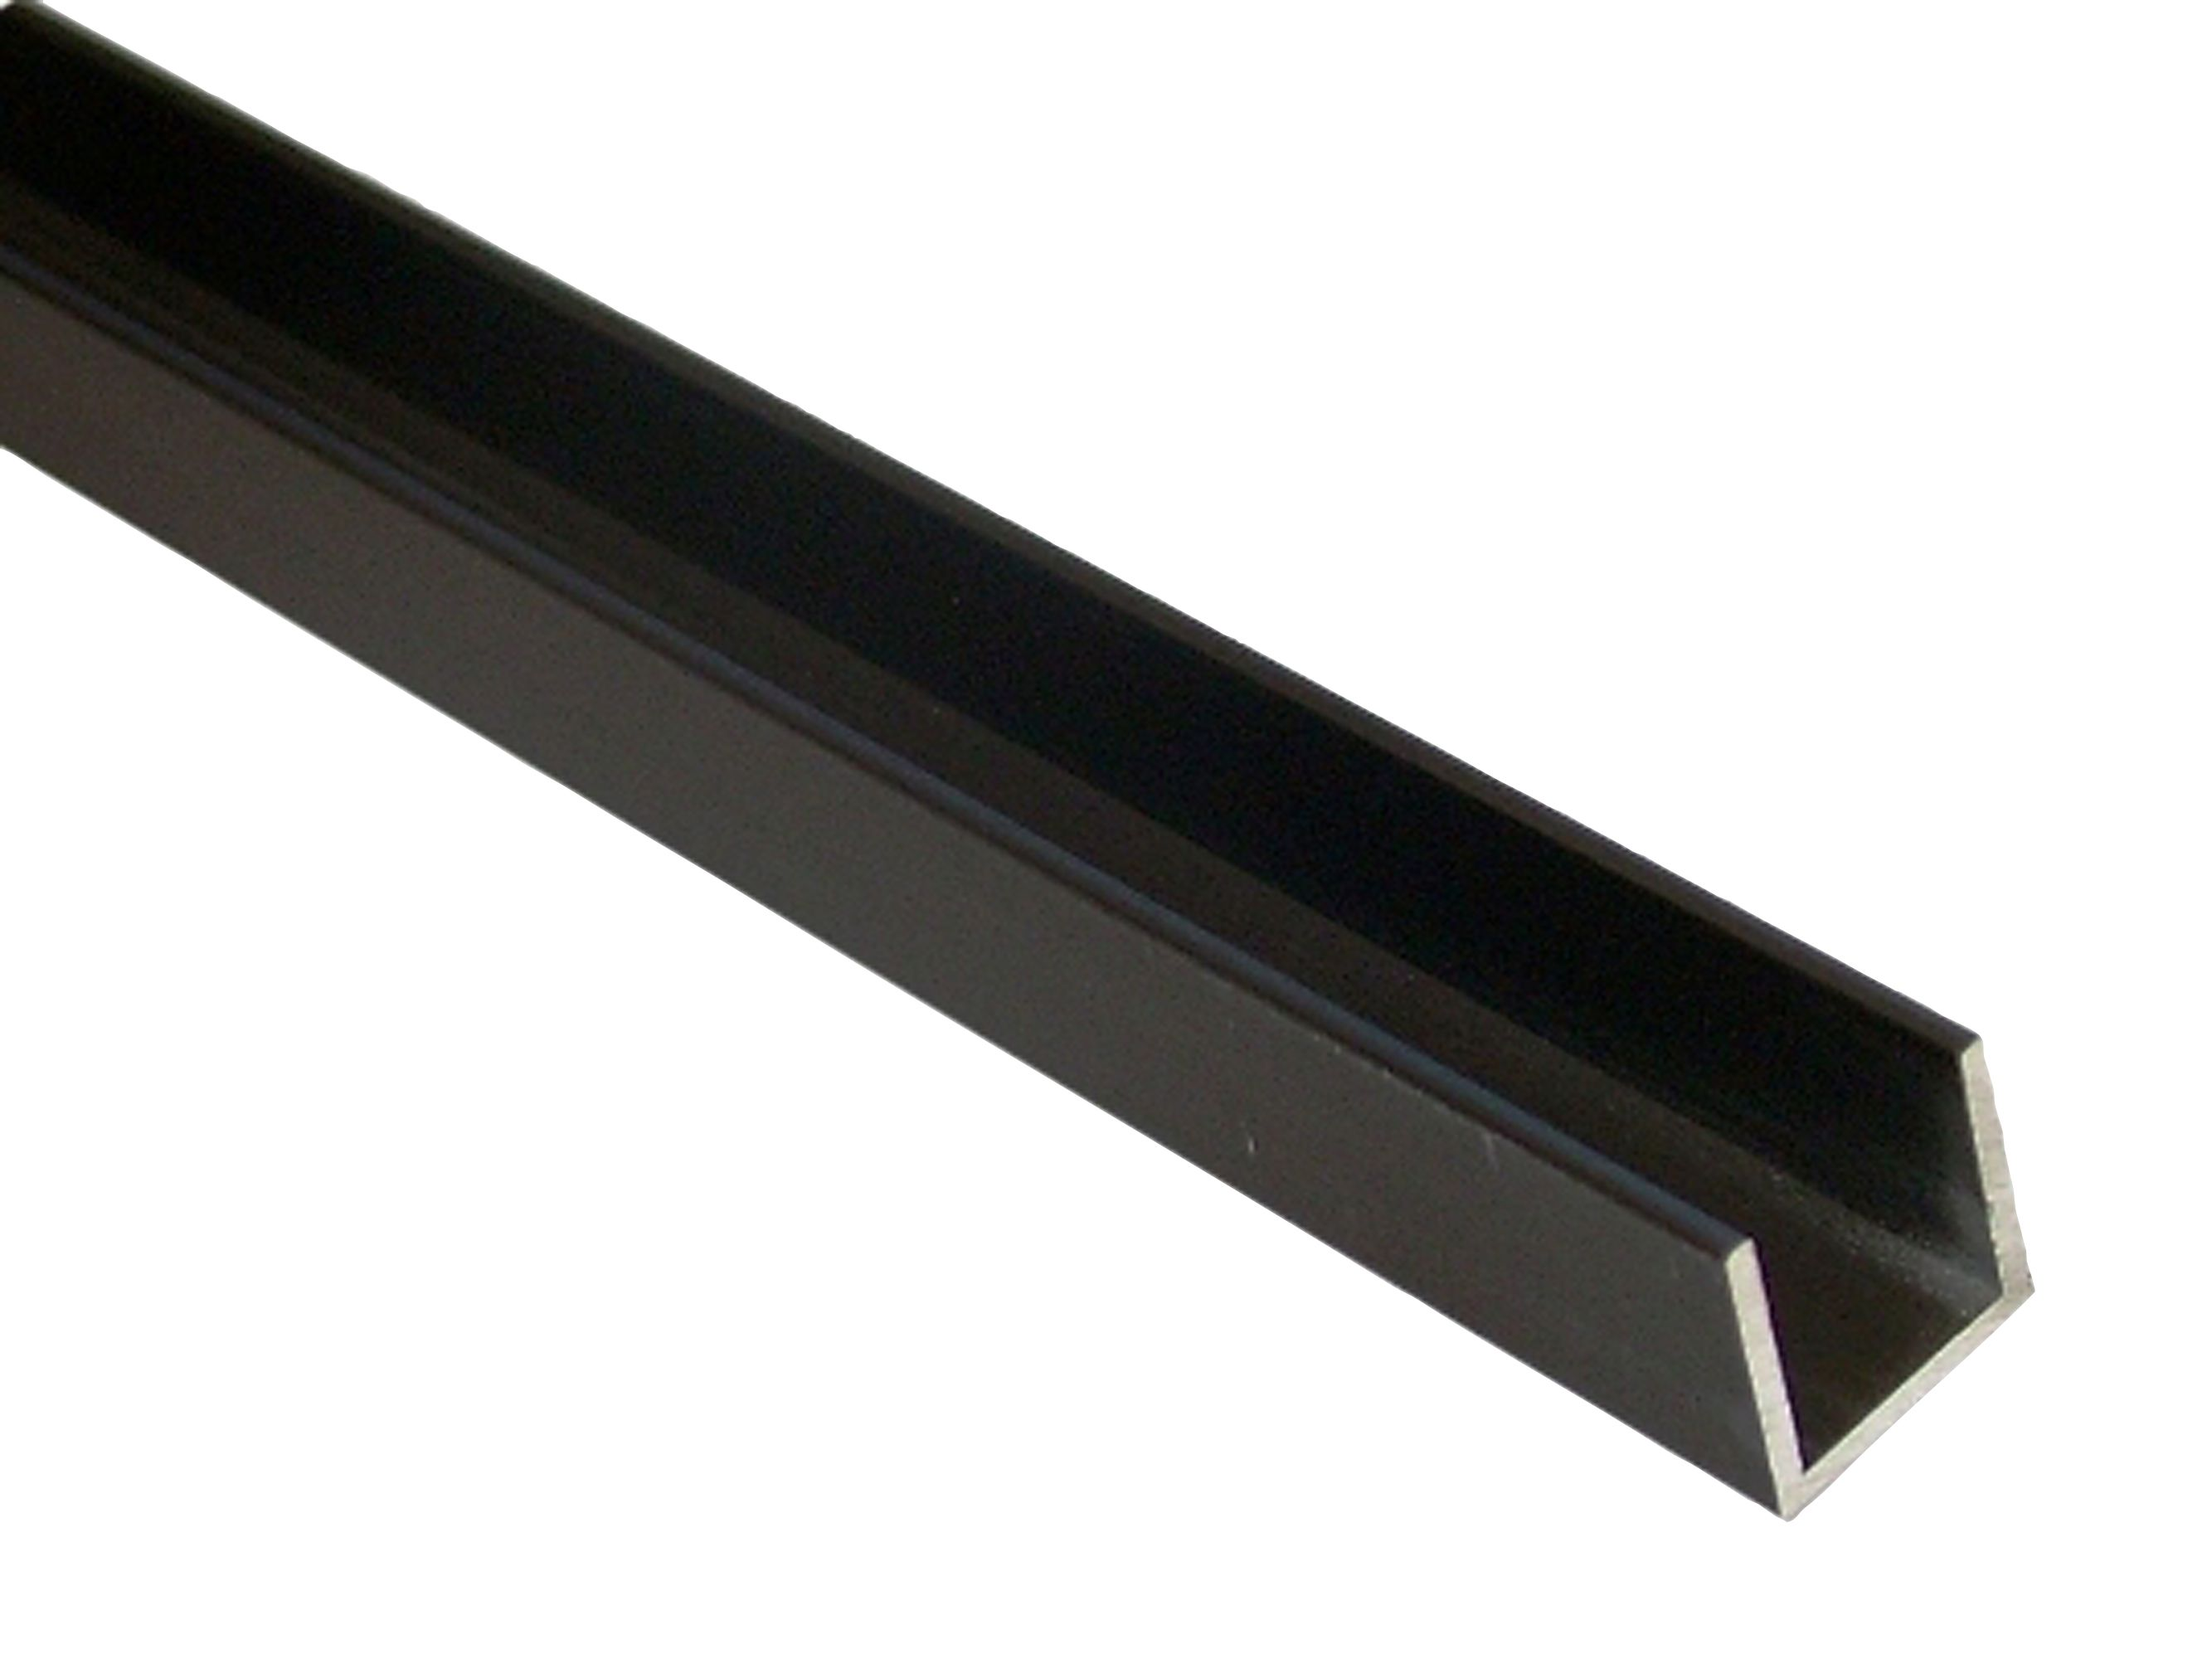 Schön Aluminium U Profile (H)10mm (W)13mm (L)2m | Departments | DIY at B&Q ZT04